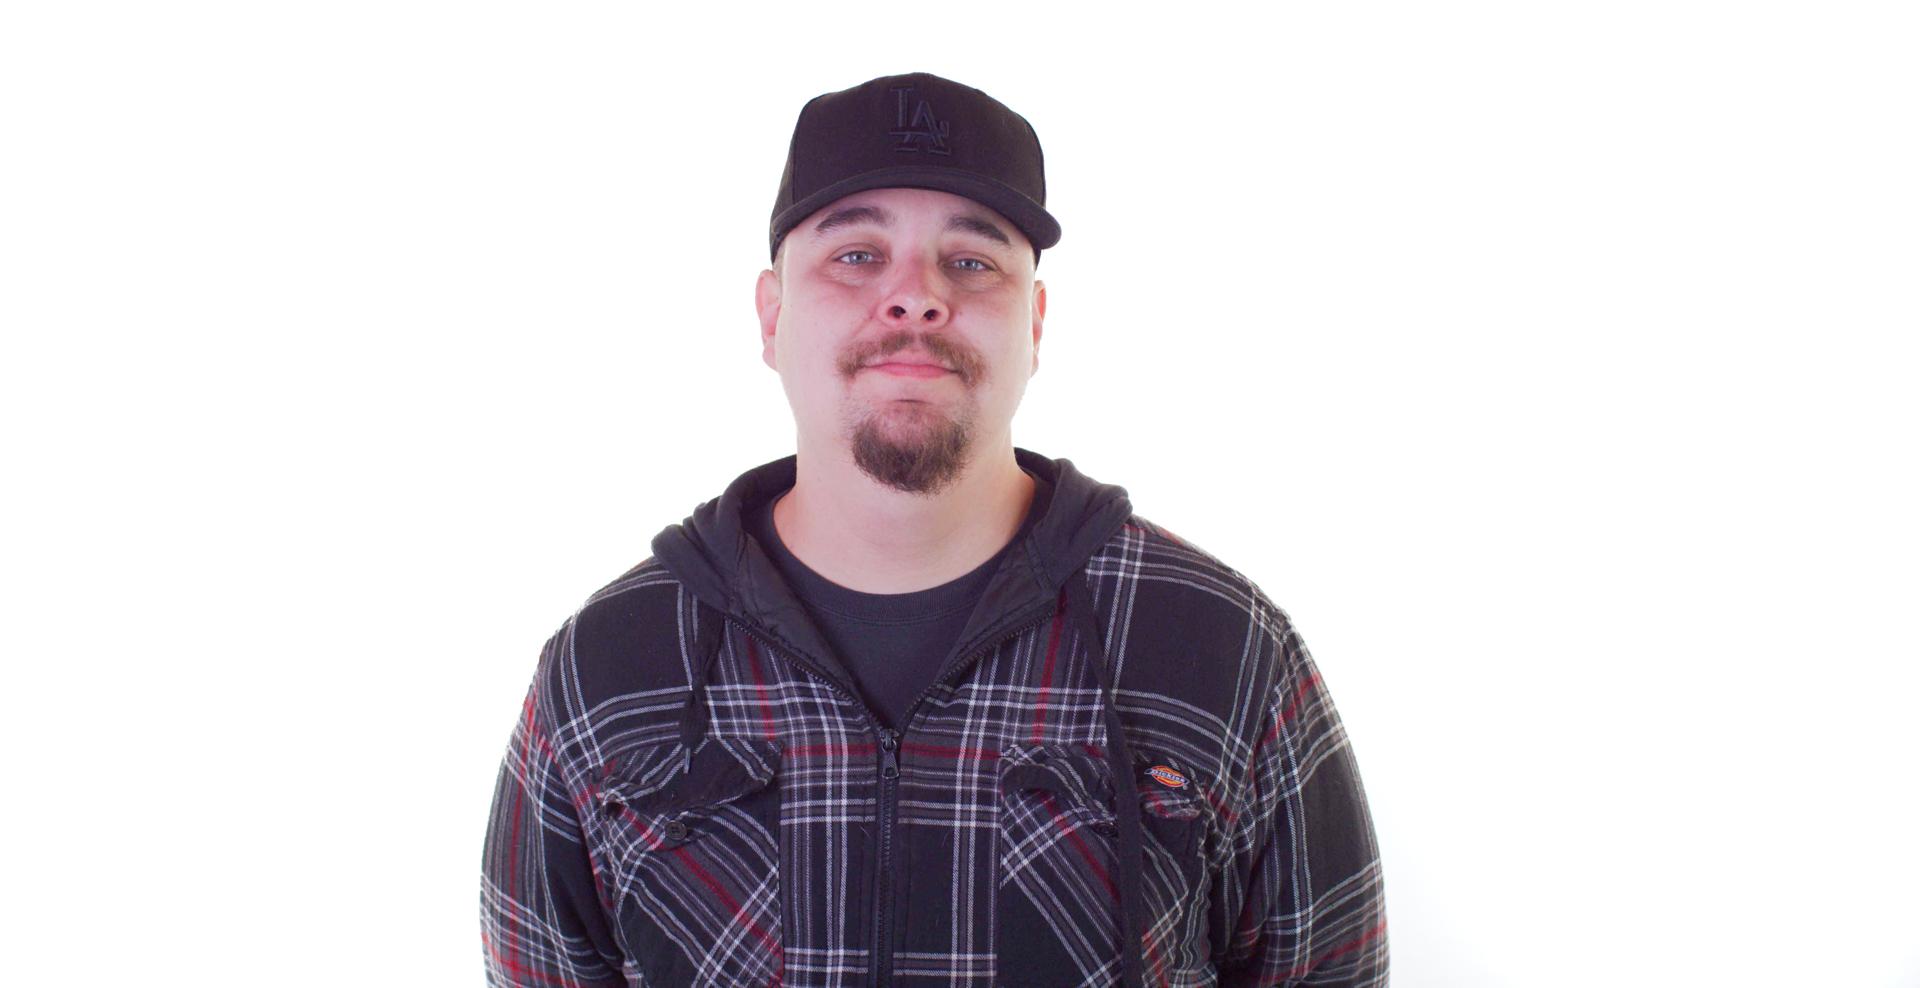 Jesse Canas, Fabricator